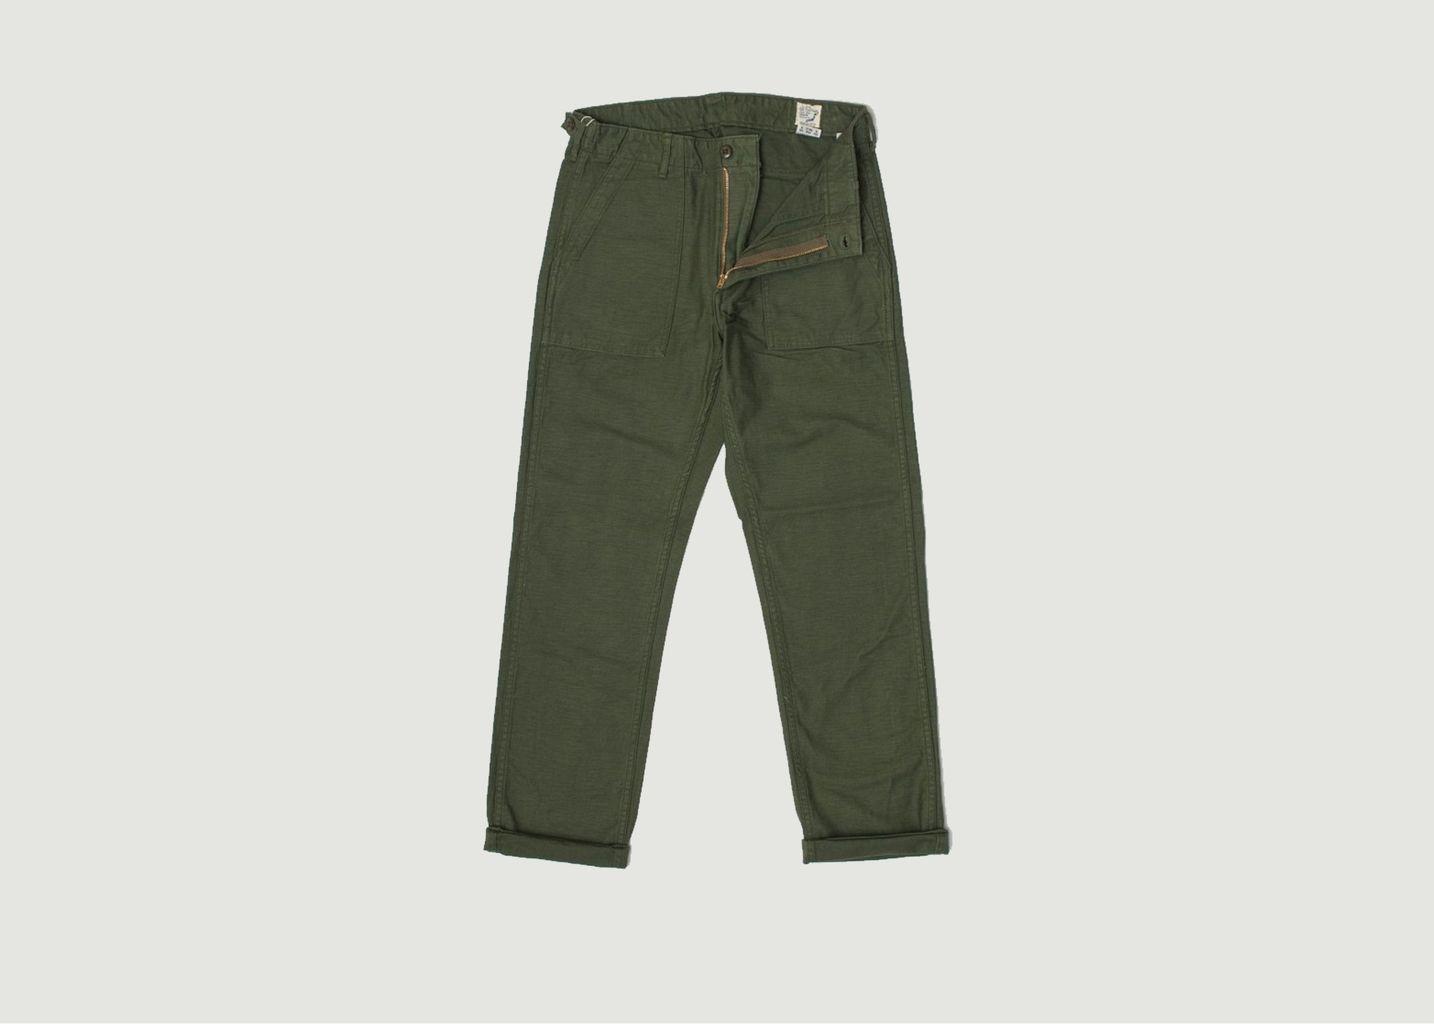 Pantalon Fatigue  - orSlow